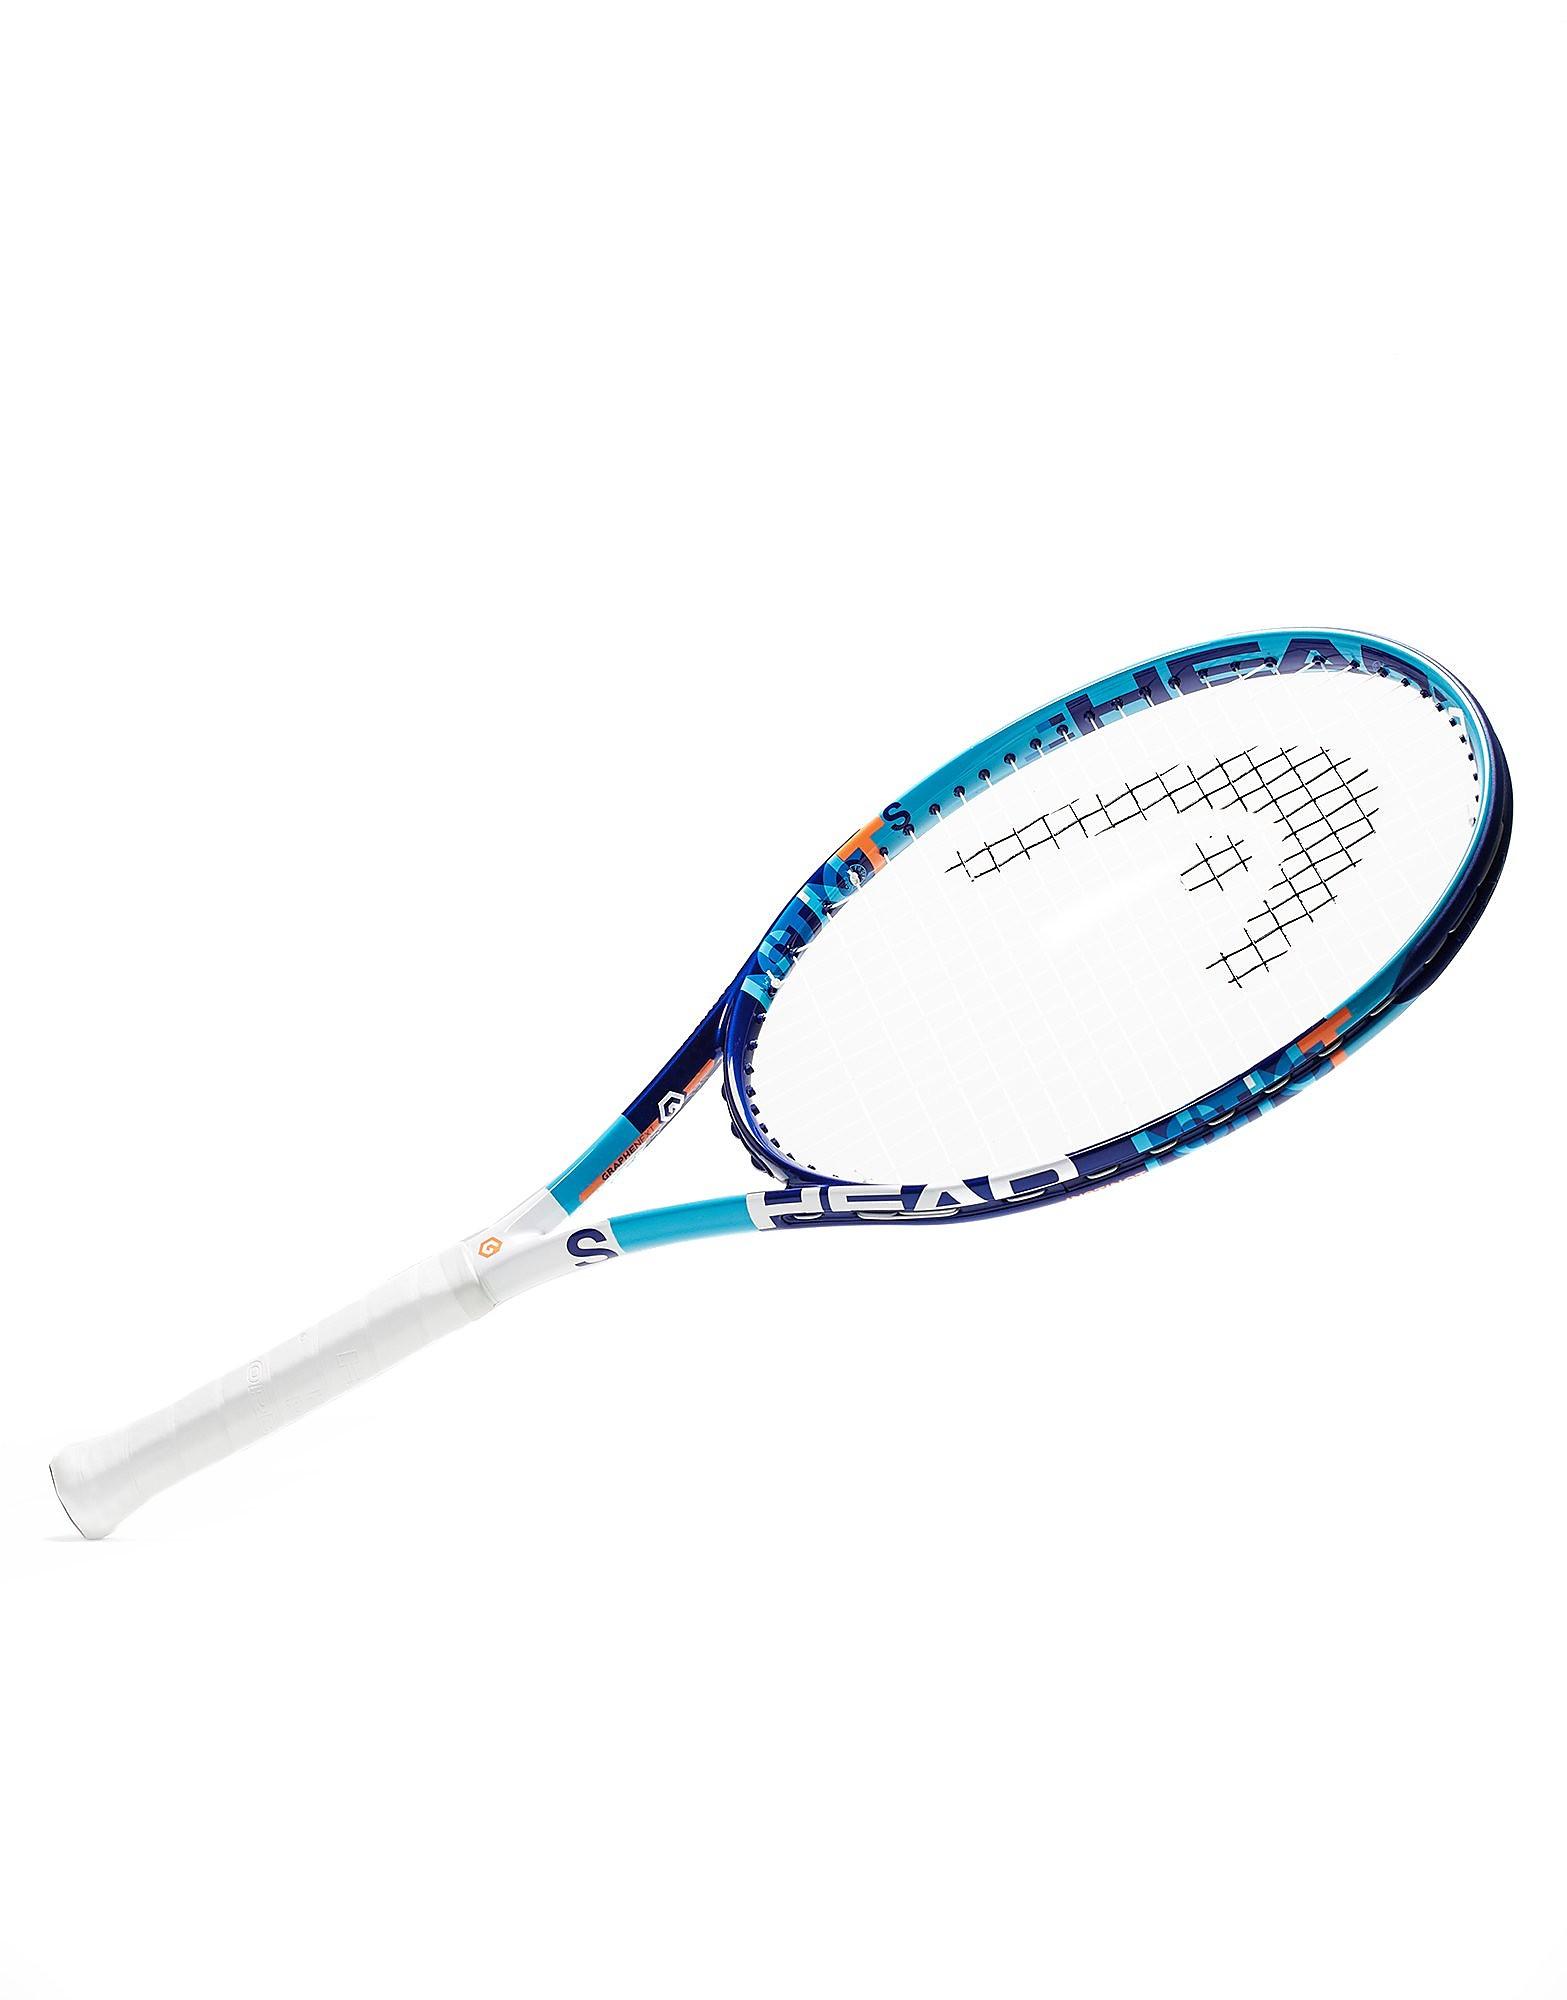 Head Graphene Instinct S Tennis Racket